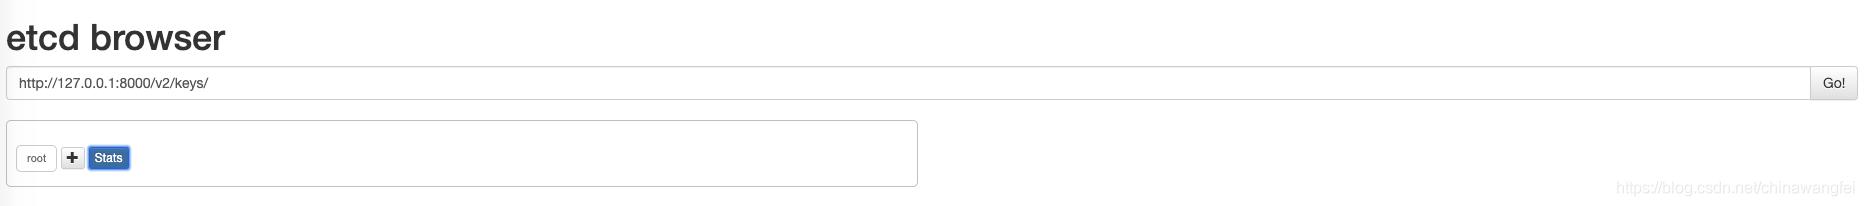 Mac安装Etcd,配置Etcd可视化页面Etcd Browser - chinawangfei的